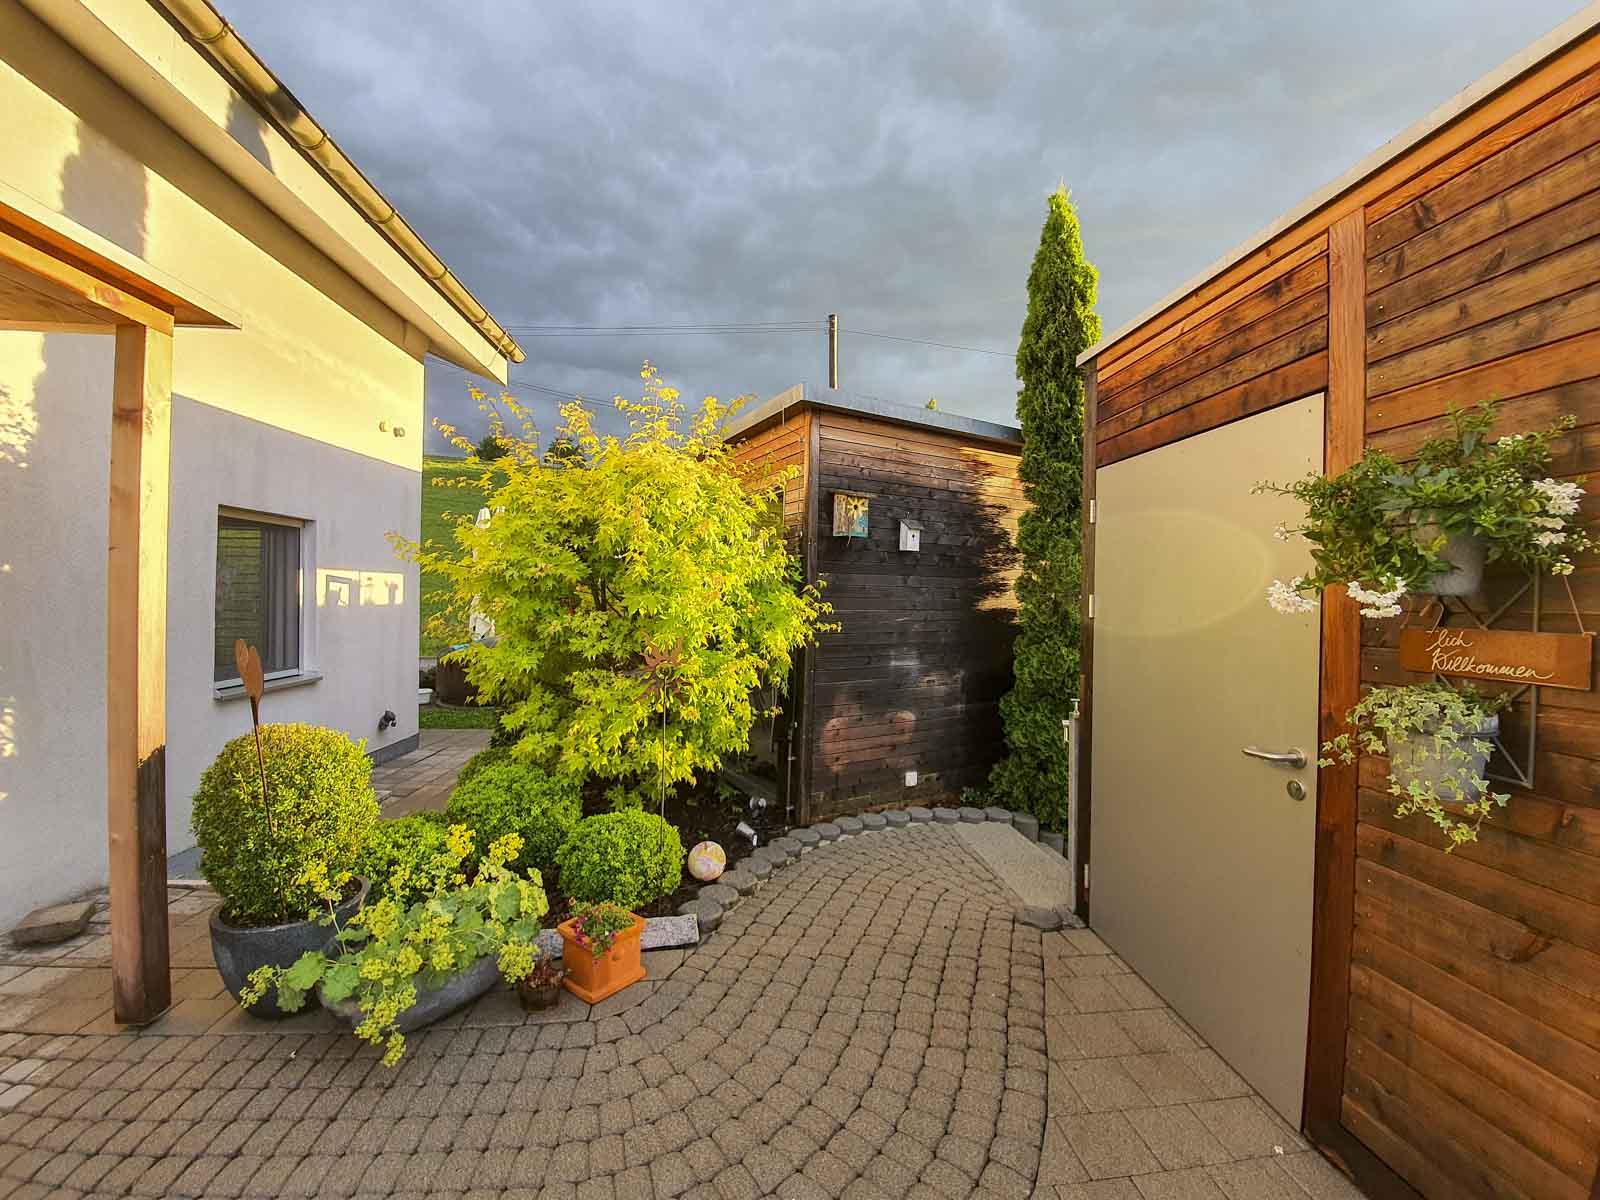 Wooddesign_Terrassengestaltung_Eingangsbereich_Pergola_Reduit_Naturholz_Lärchenholz vergraut (5)